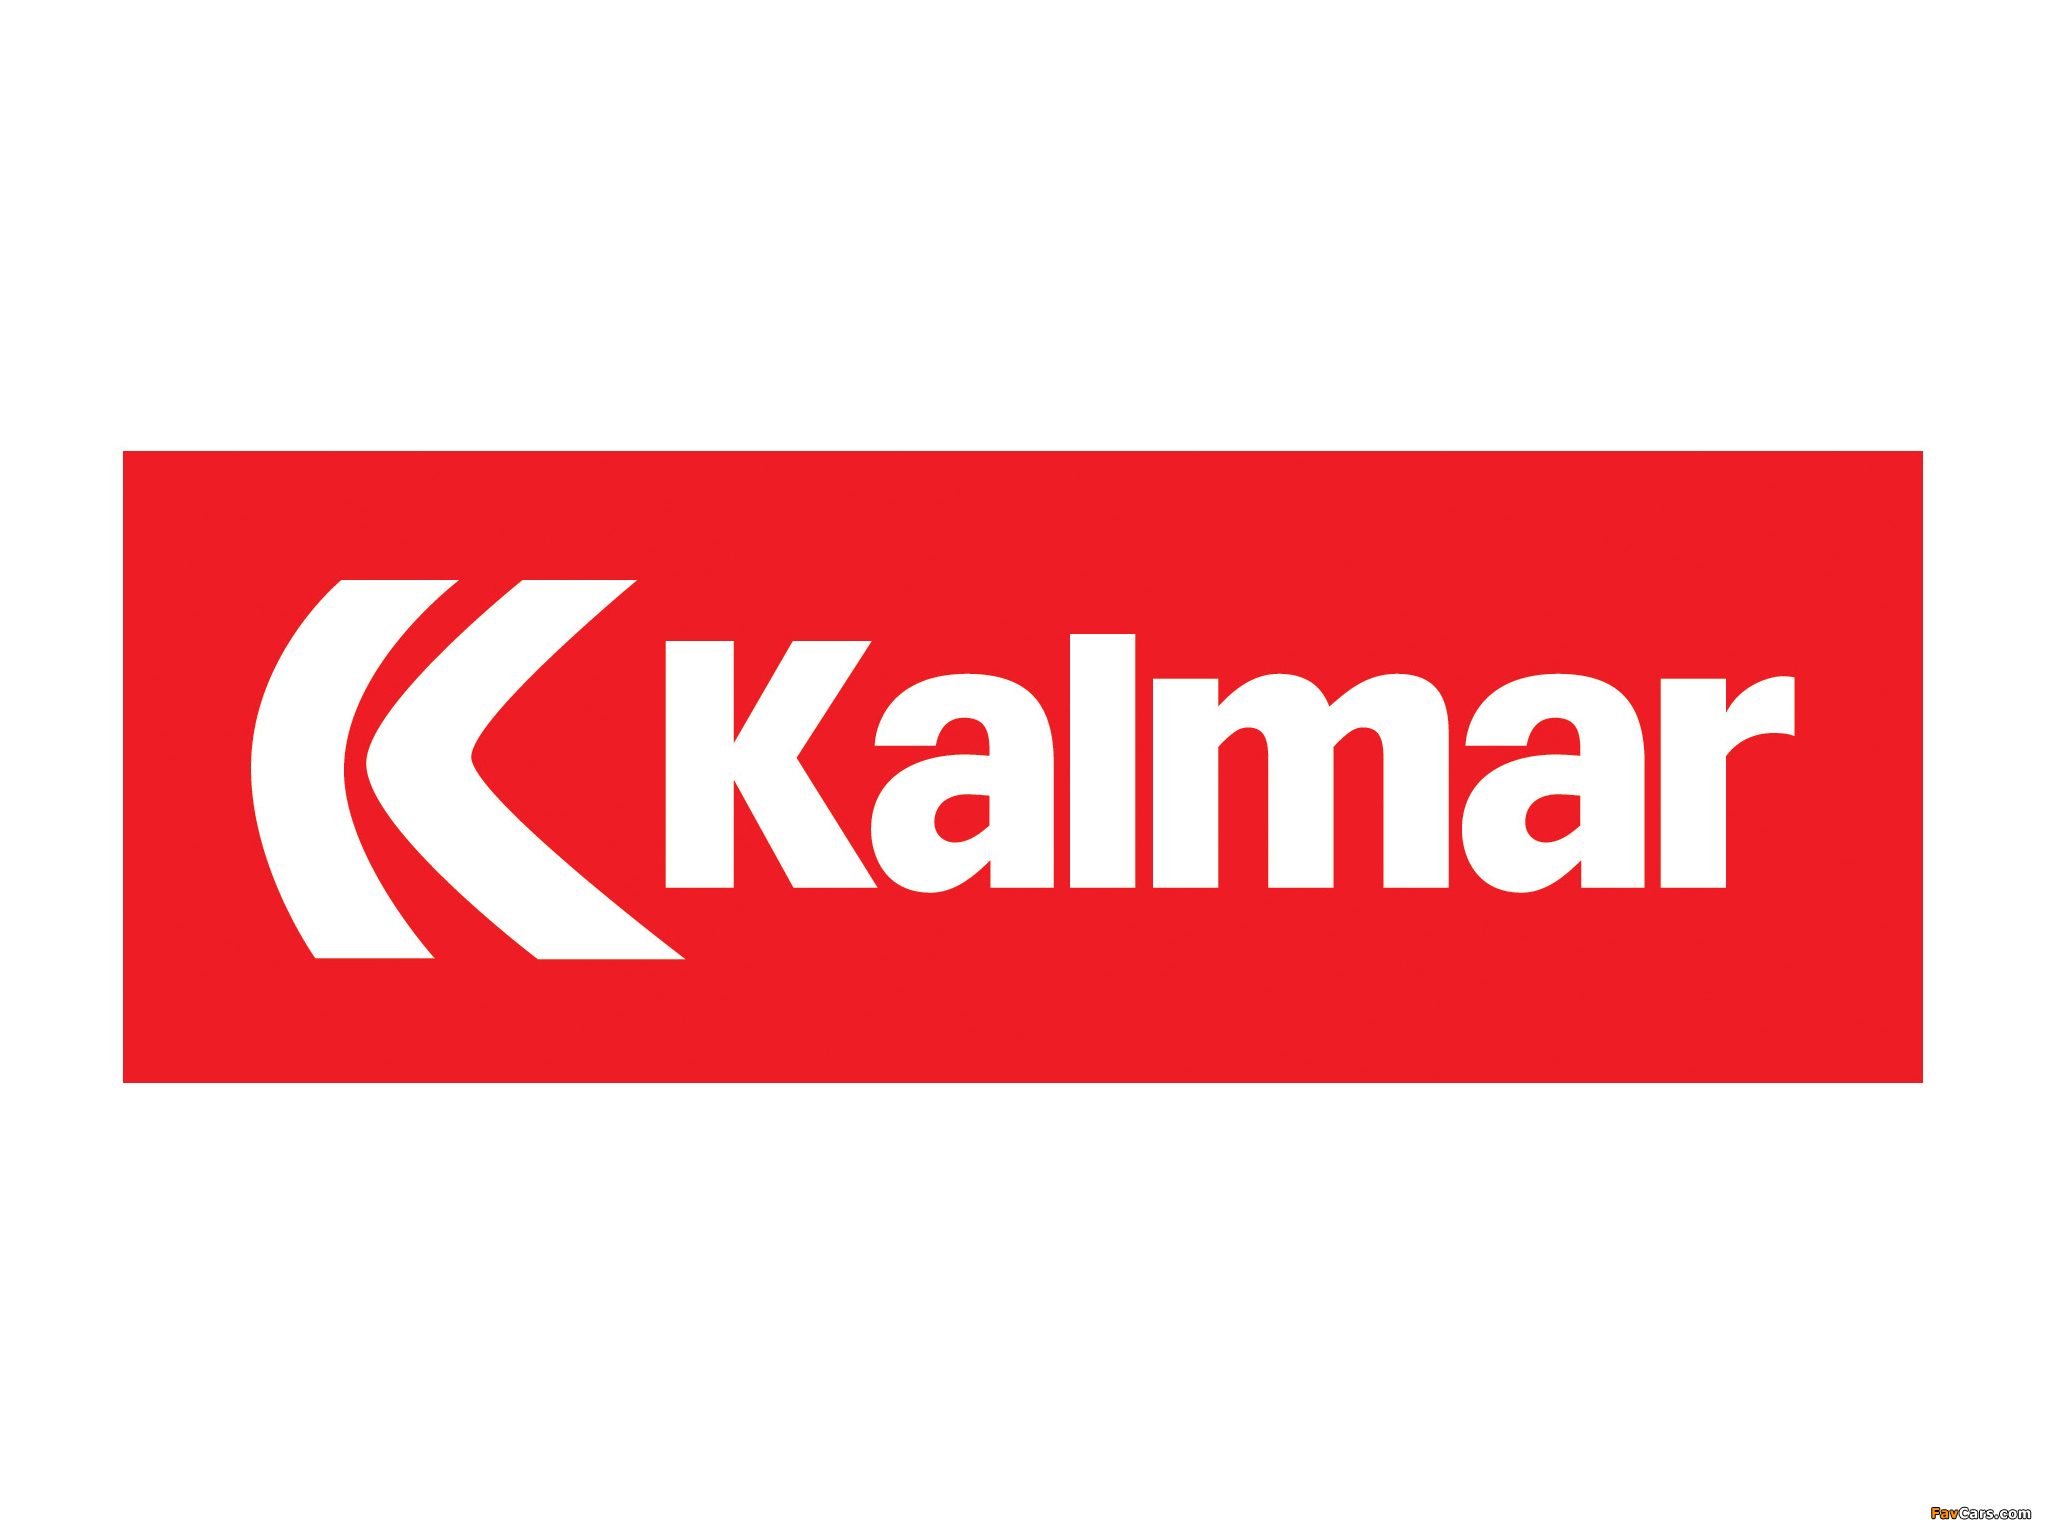 Kalmar pictures (2048 x 1536)